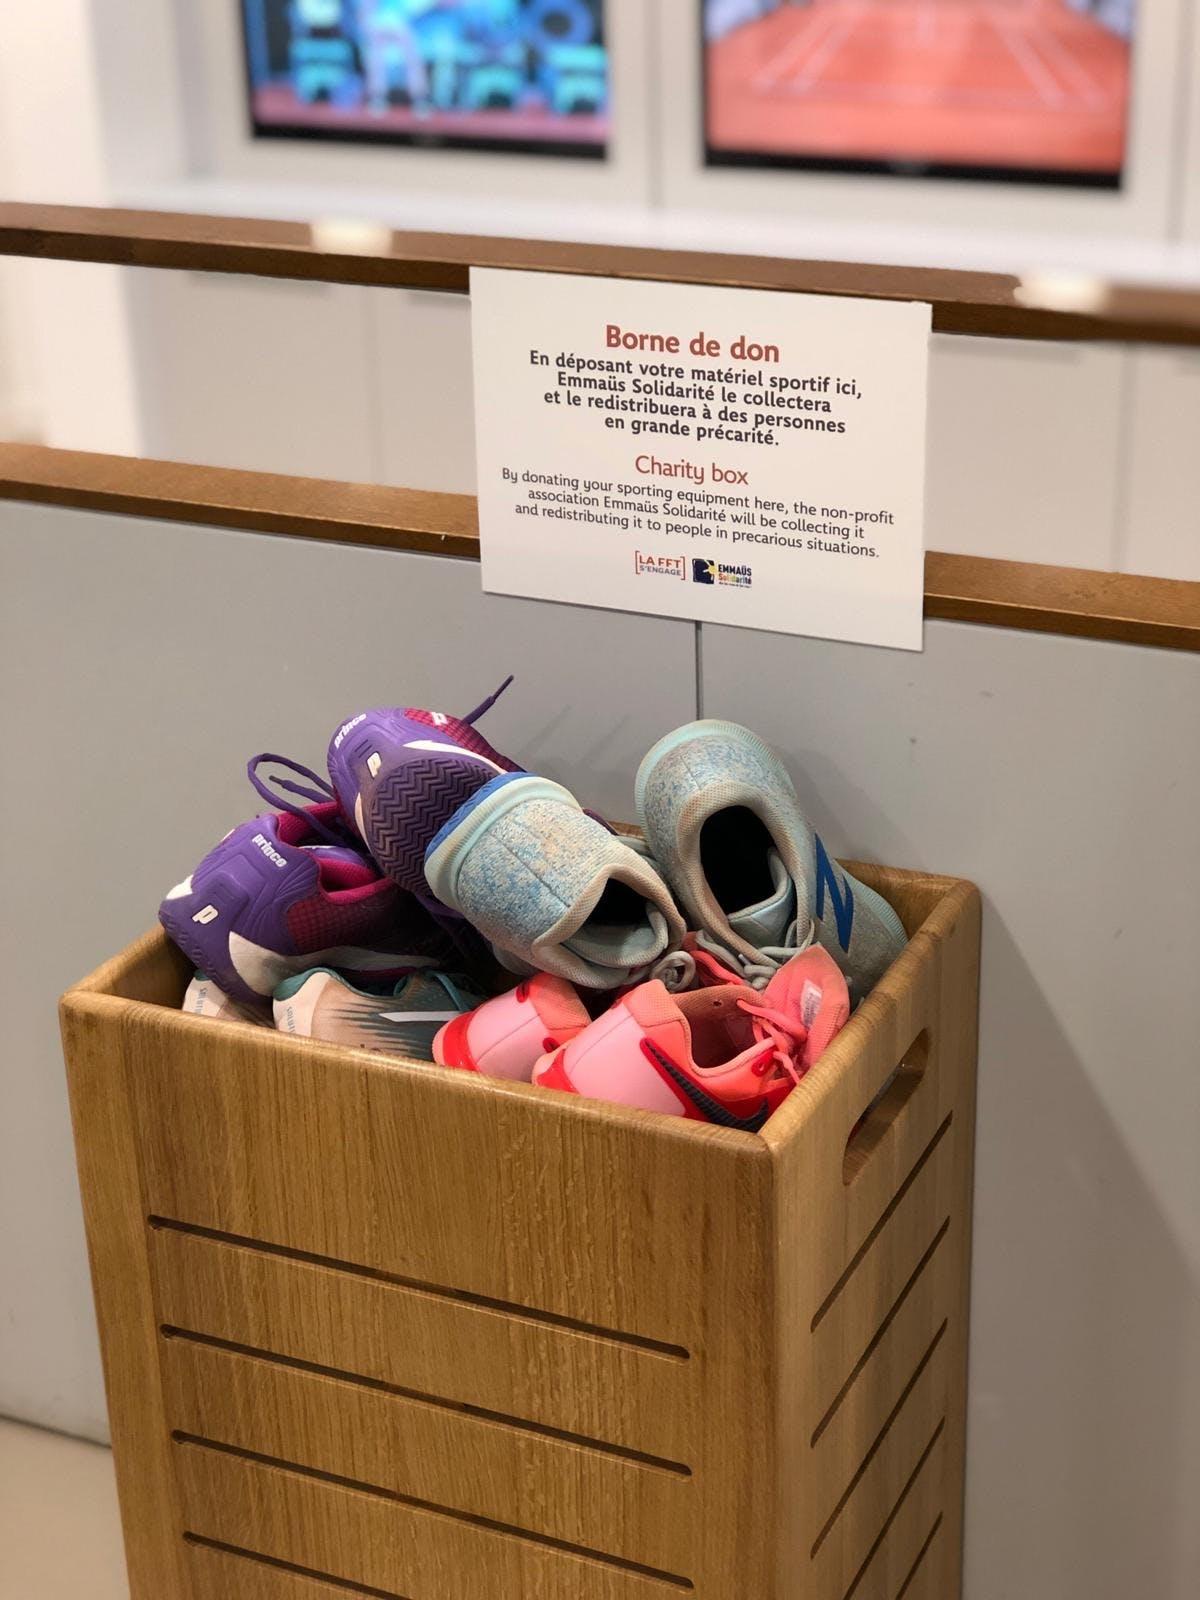 Borne de don à Roland-Garros